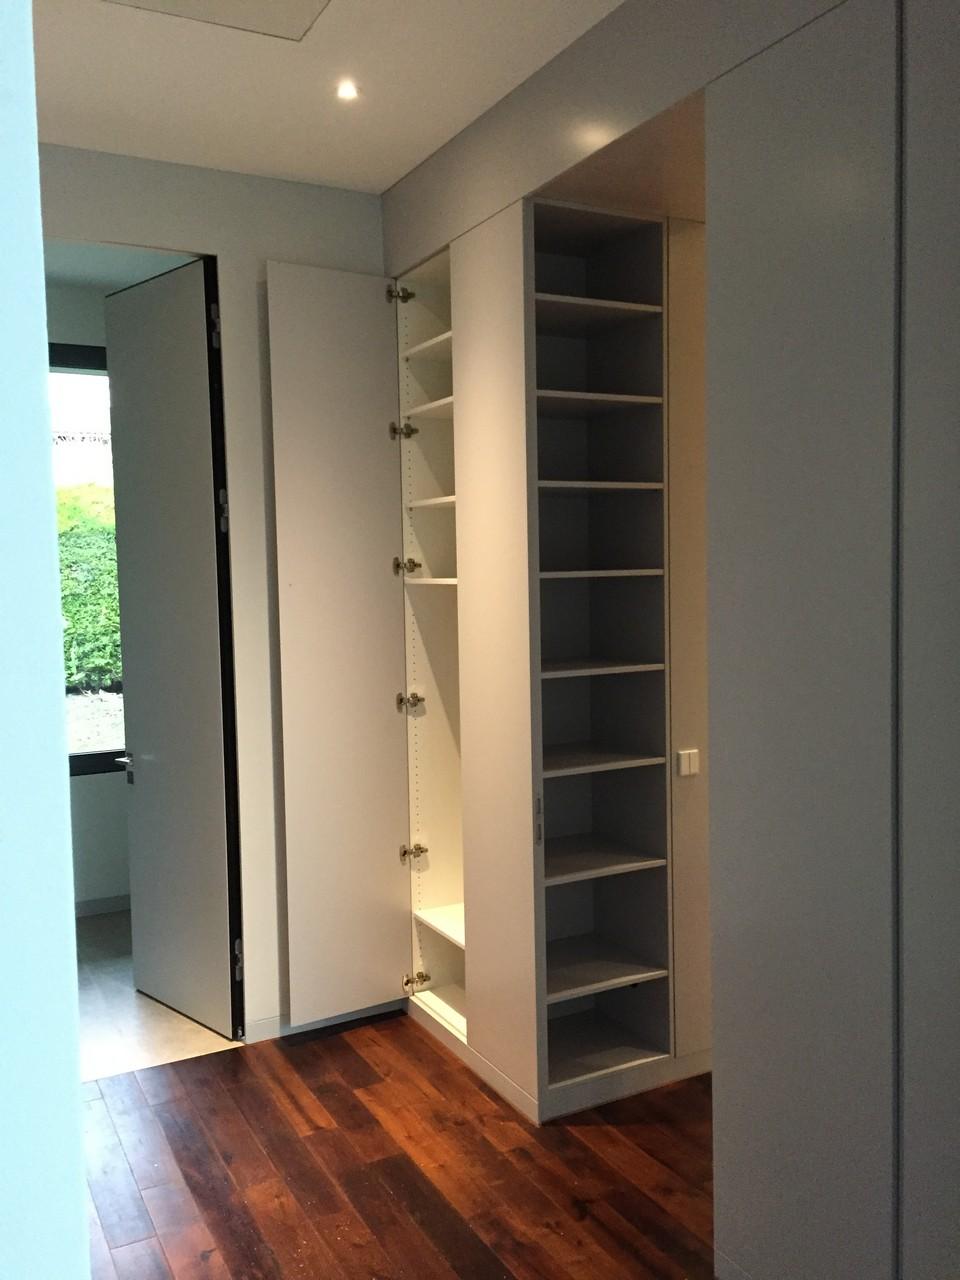 m belwerkst tte heck gmbh einbauschr nke. Black Bedroom Furniture Sets. Home Design Ideas